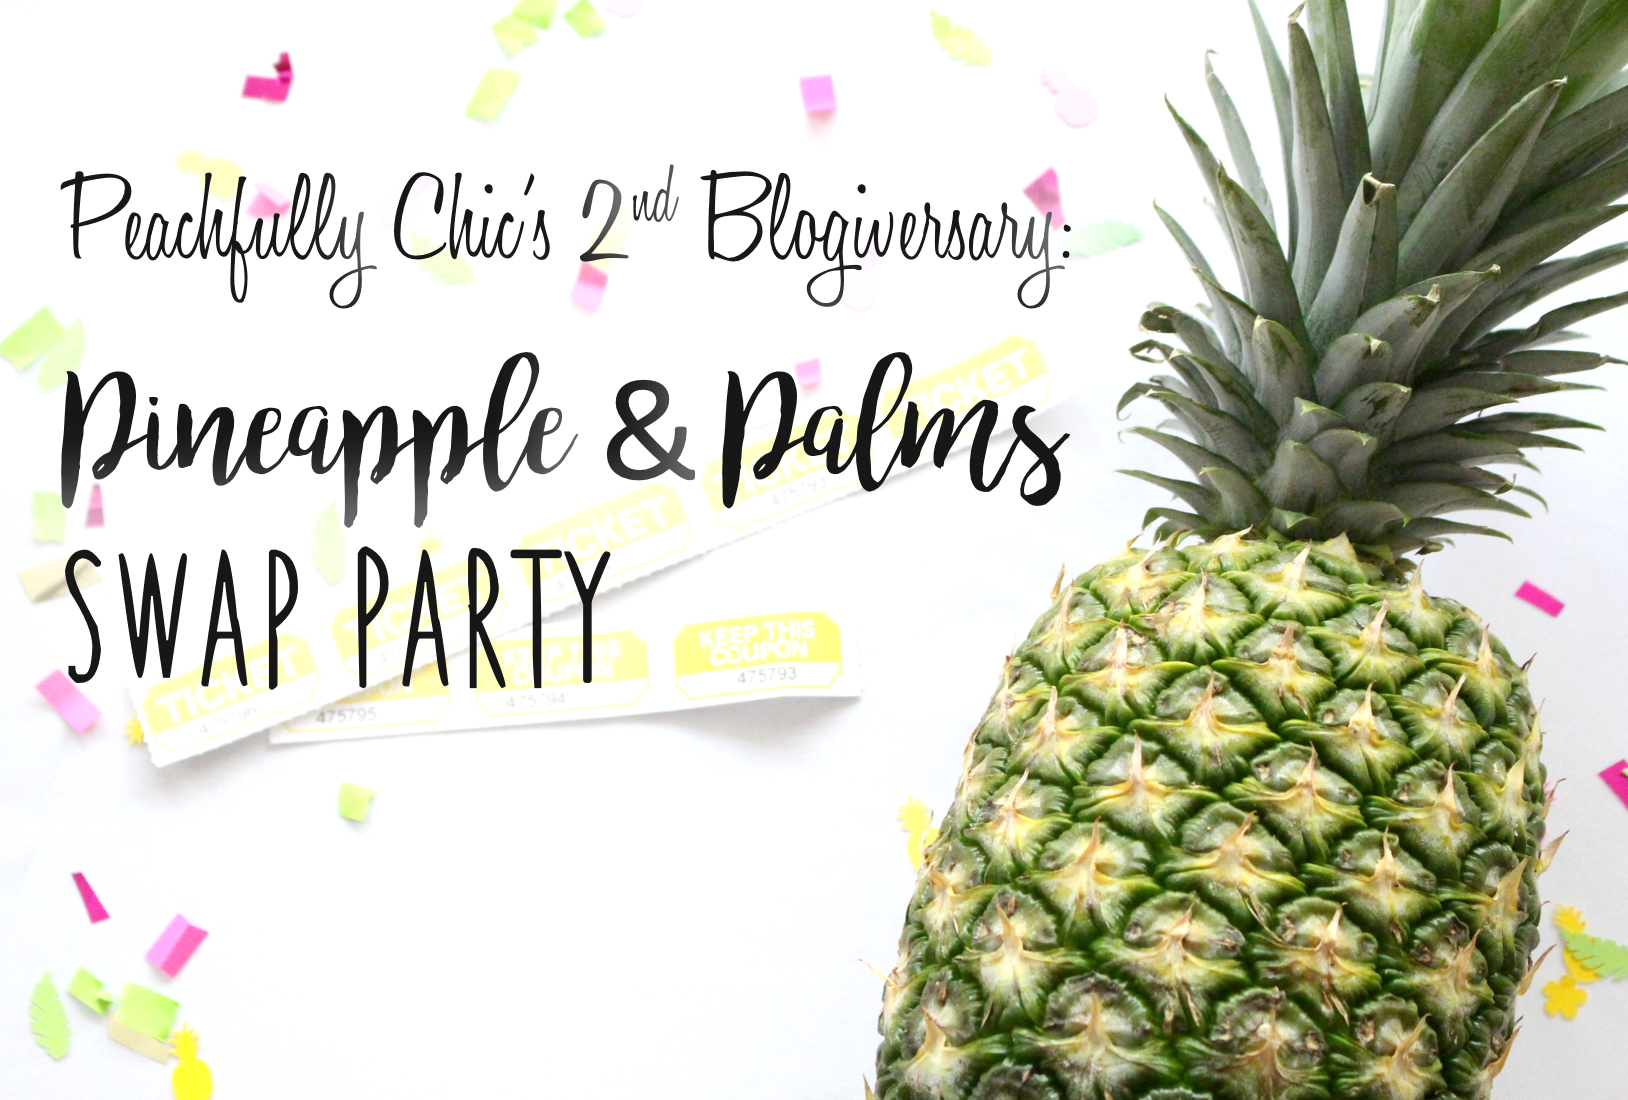 Peachfully-Chic-PCBday-Pineapple-Anniversary-Blog-Swap-Party-MAIN-2